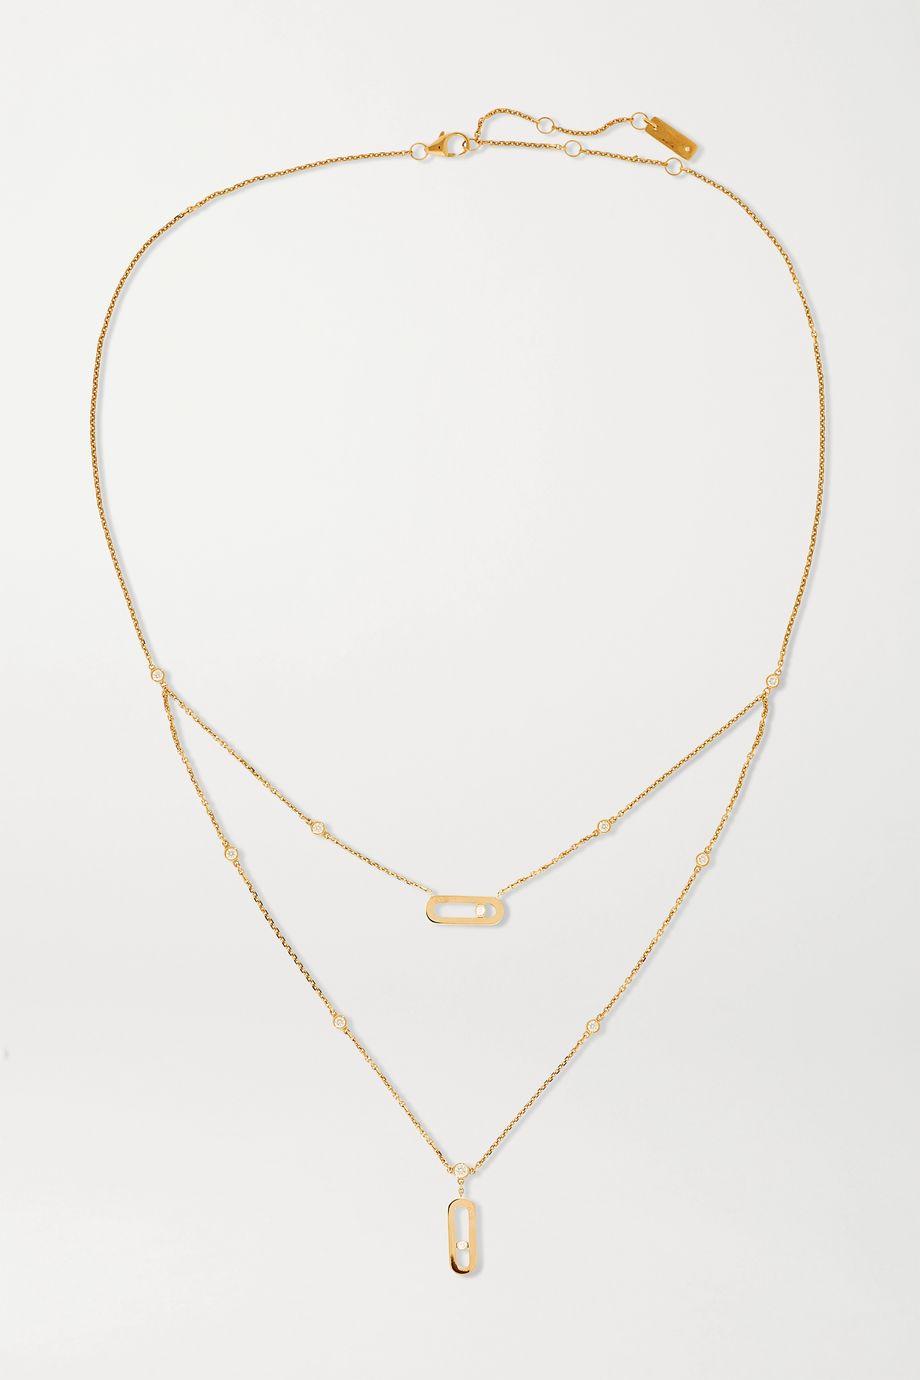 Messika Collier en or rose 18 carats et diamants Move Uno